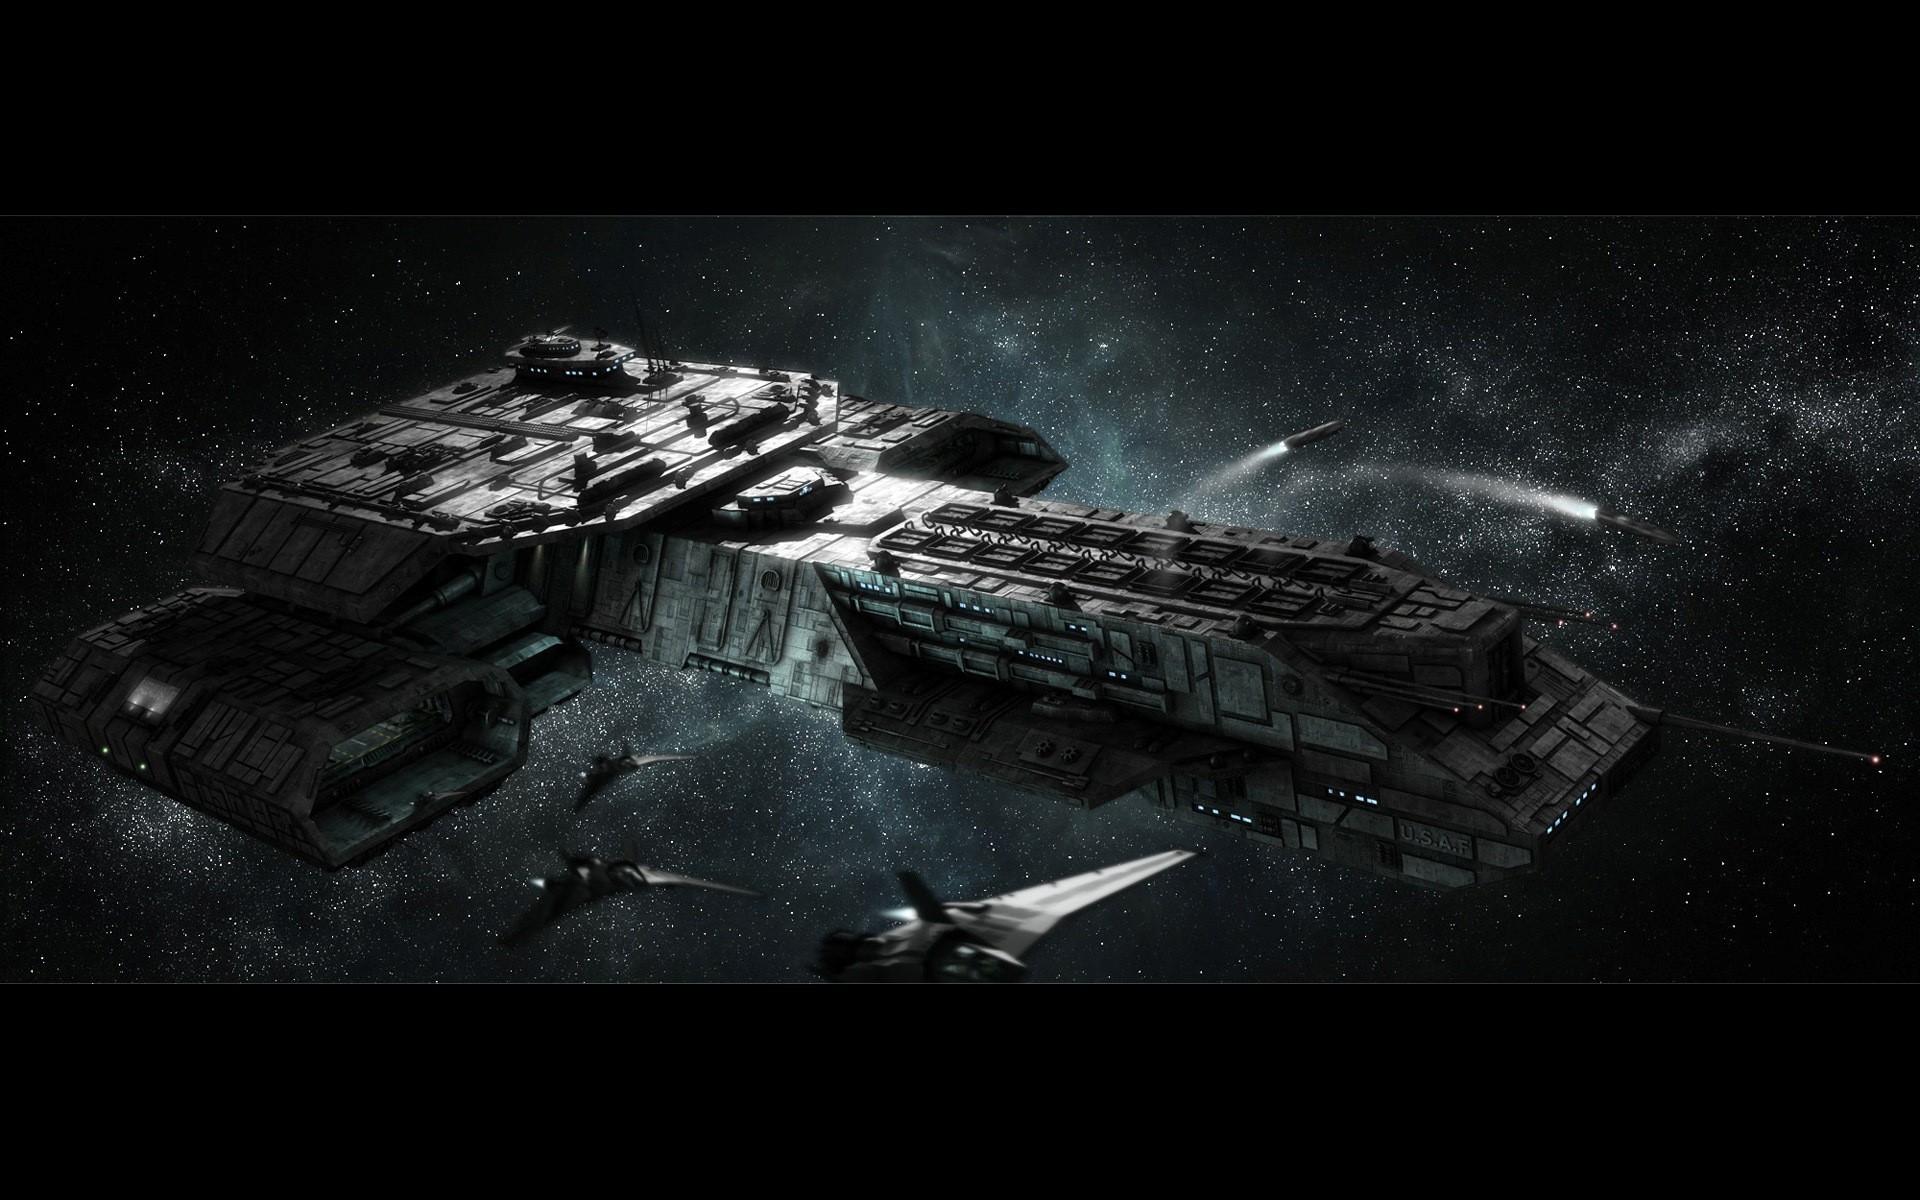 Papel De Parede Monocromático Veículo Stargate Meia